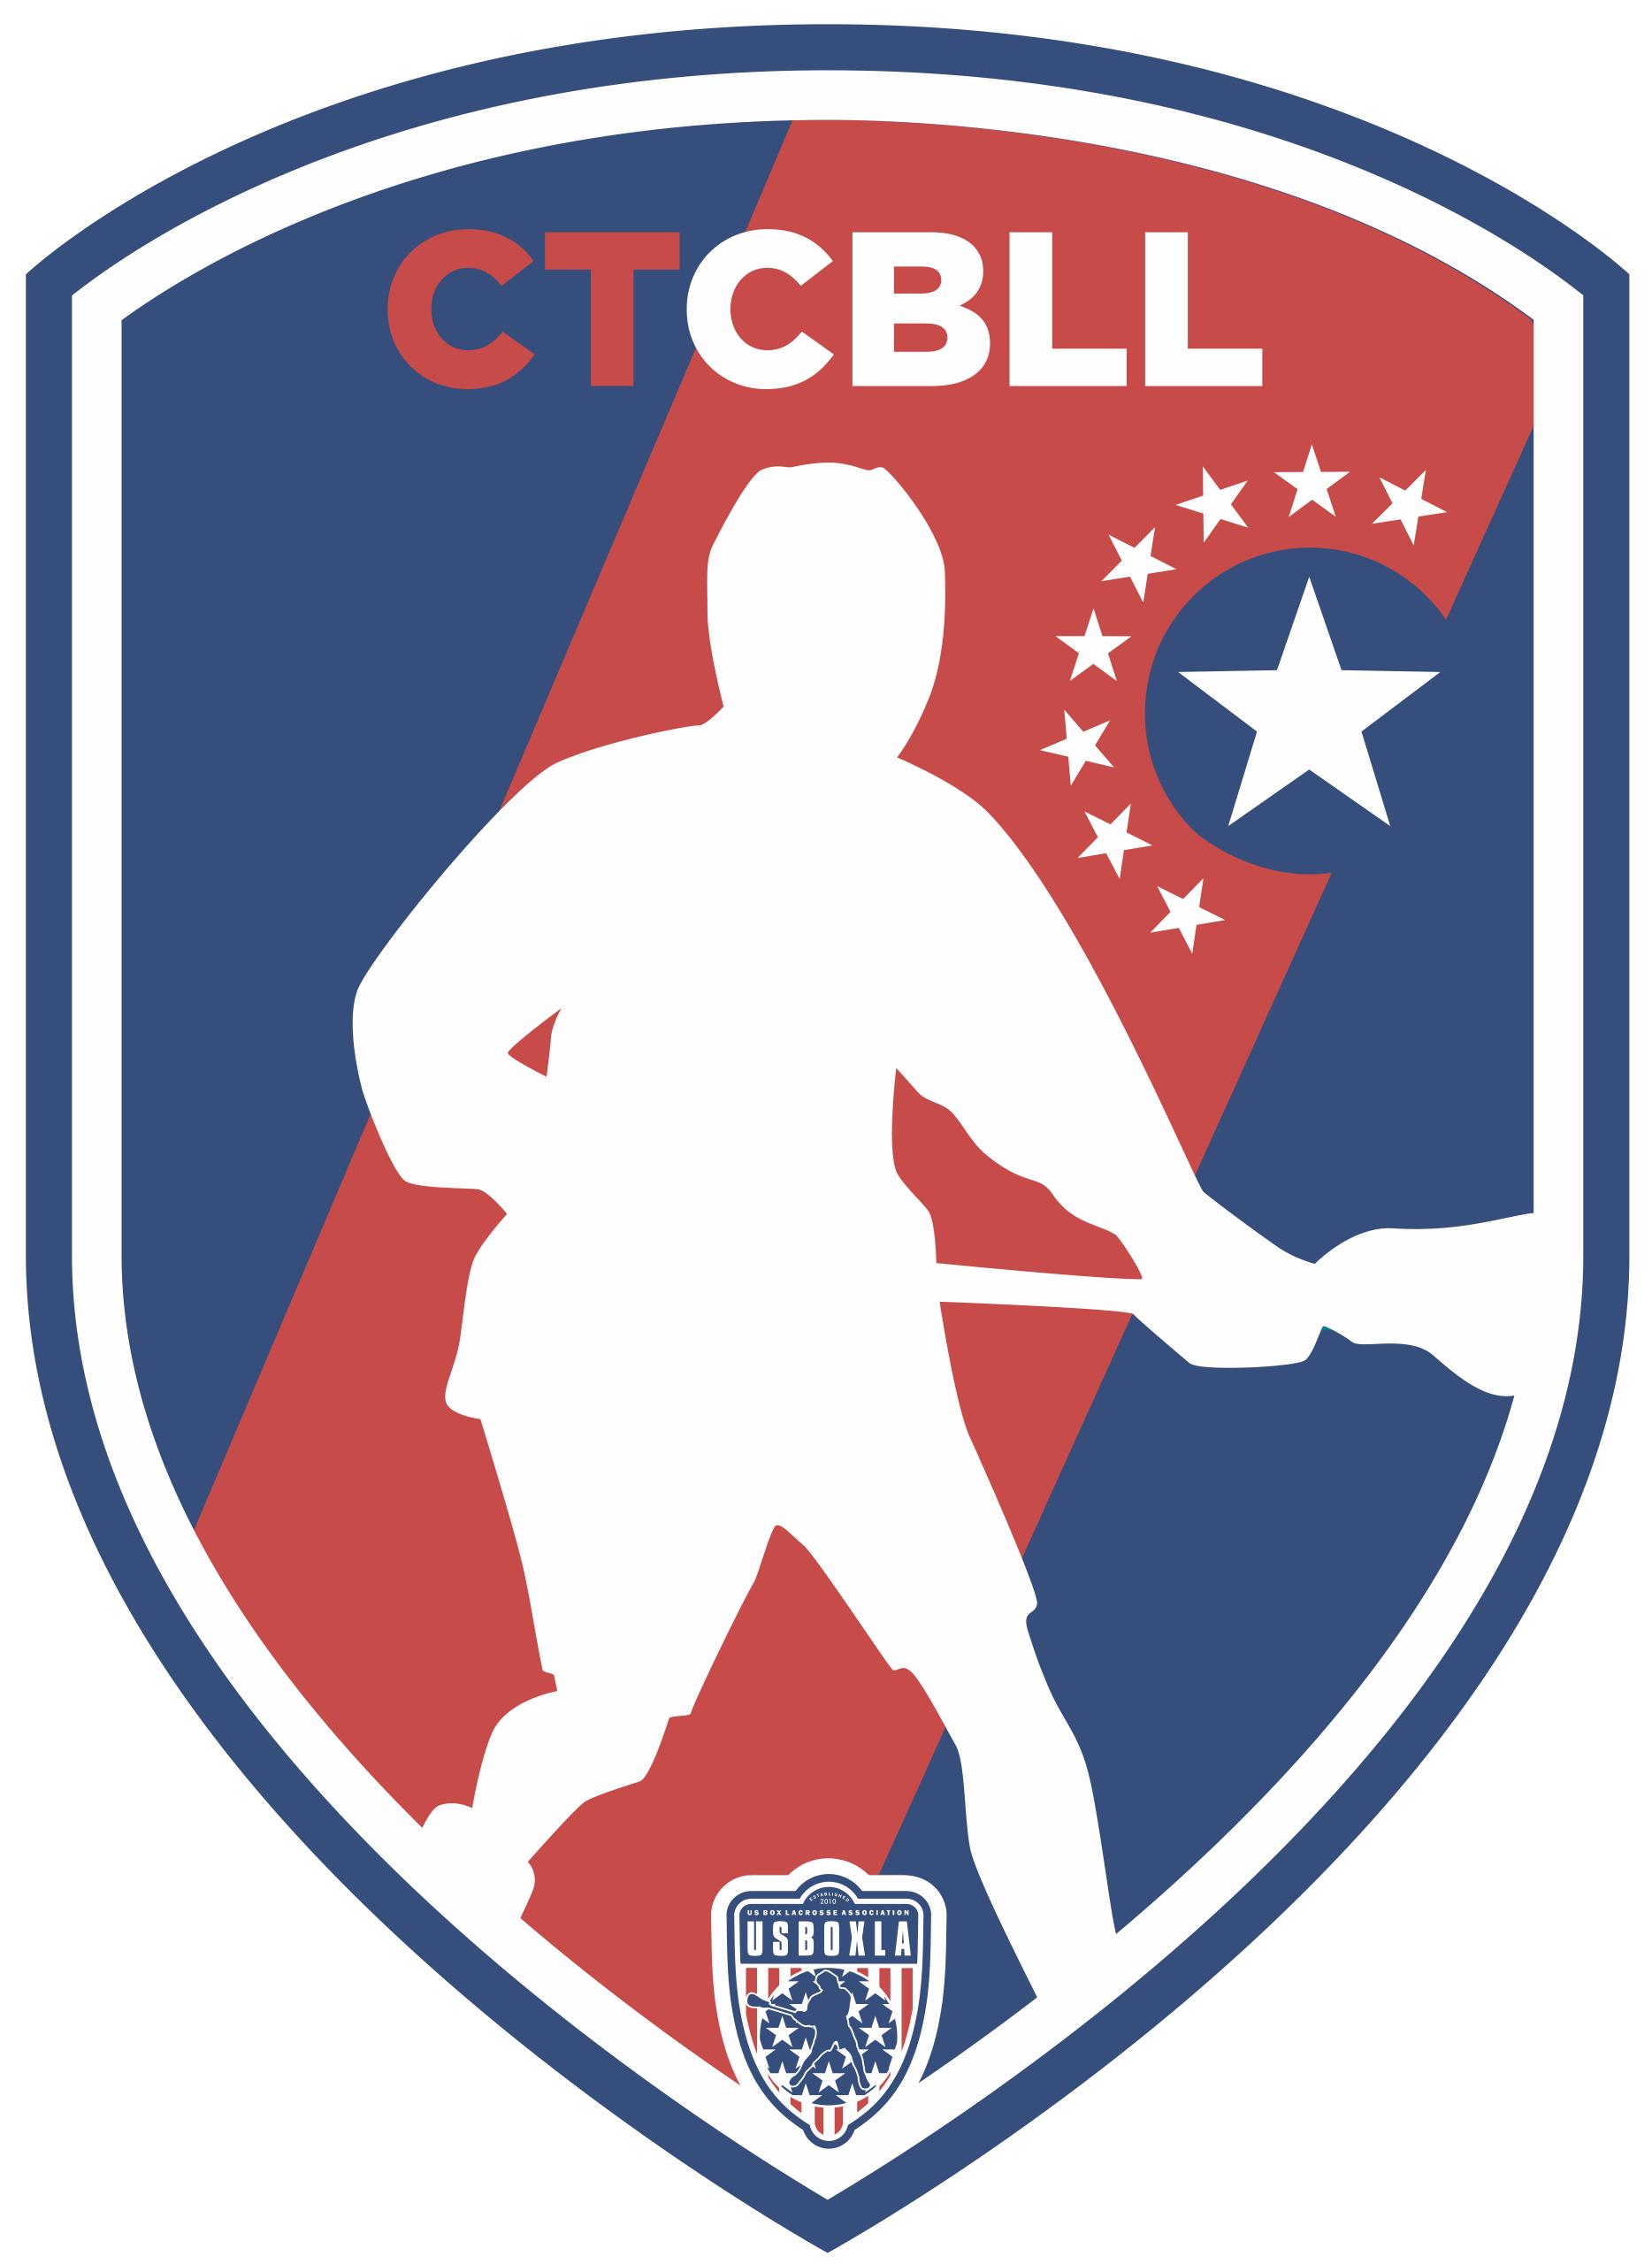 ctcbll21-logo